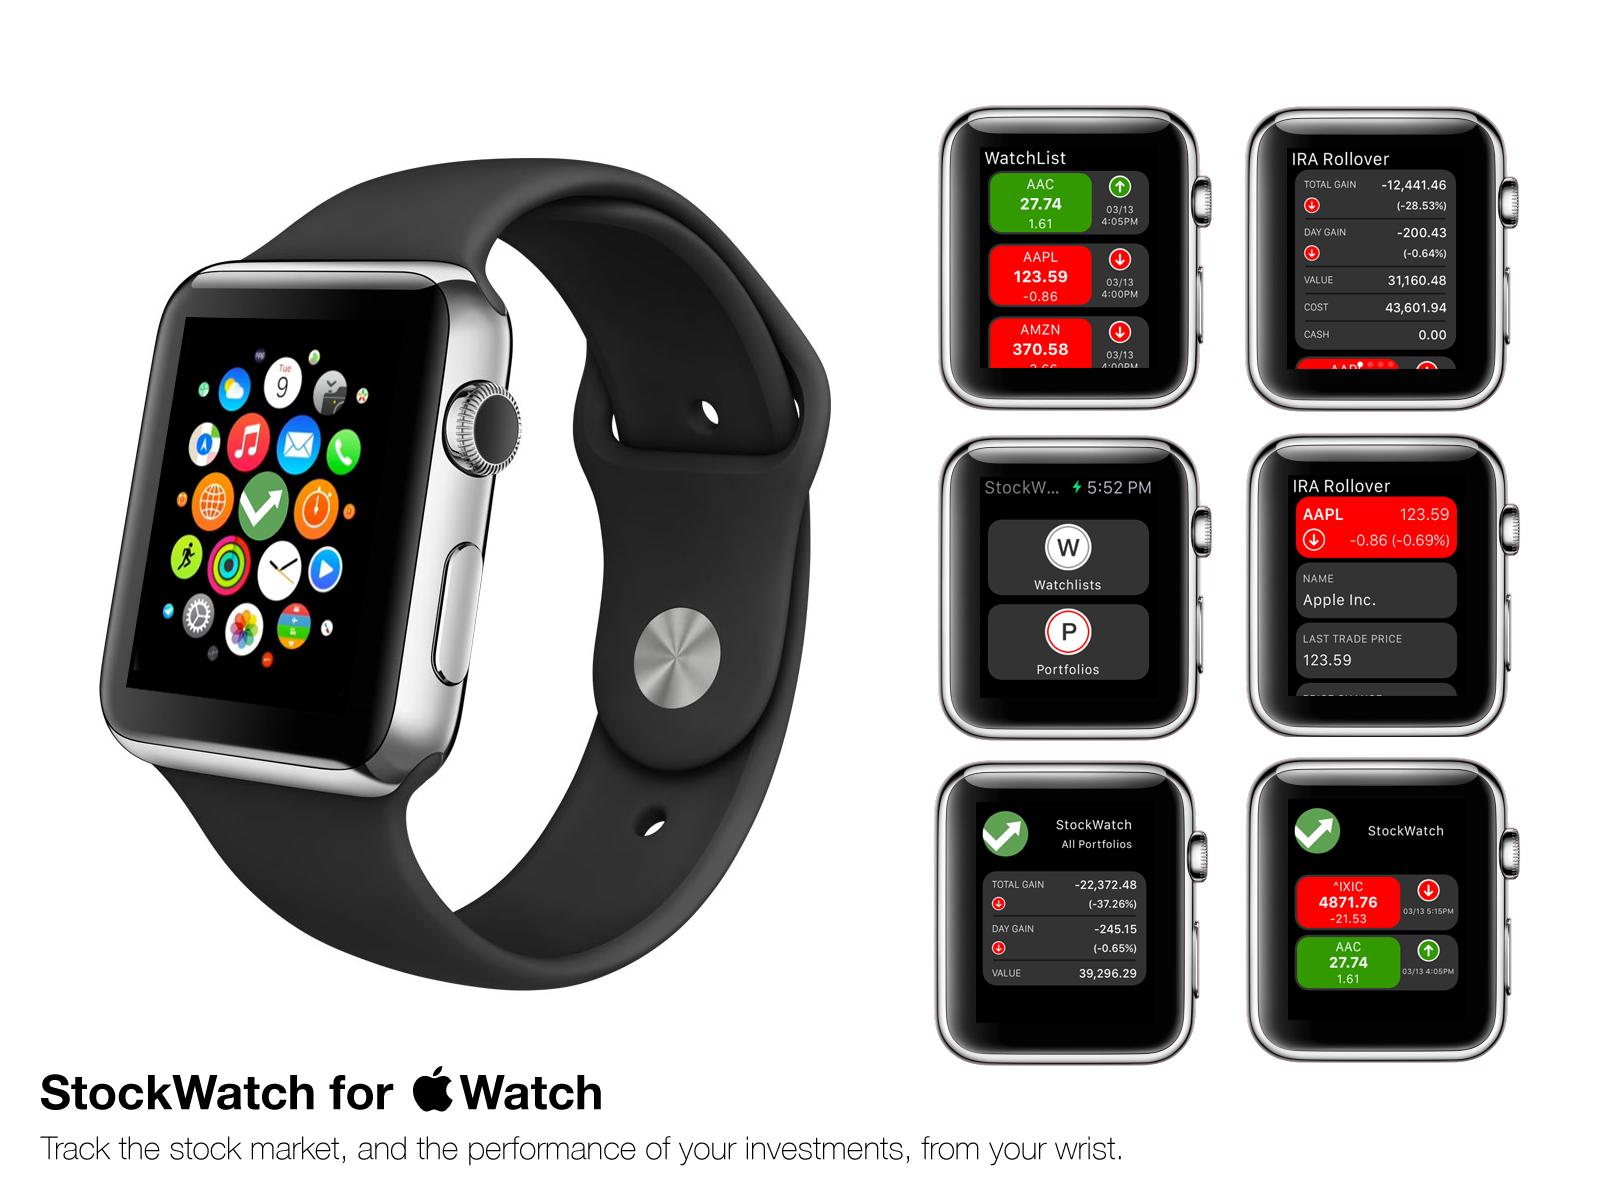 toughturtle llc announces stockwatch for apple watch